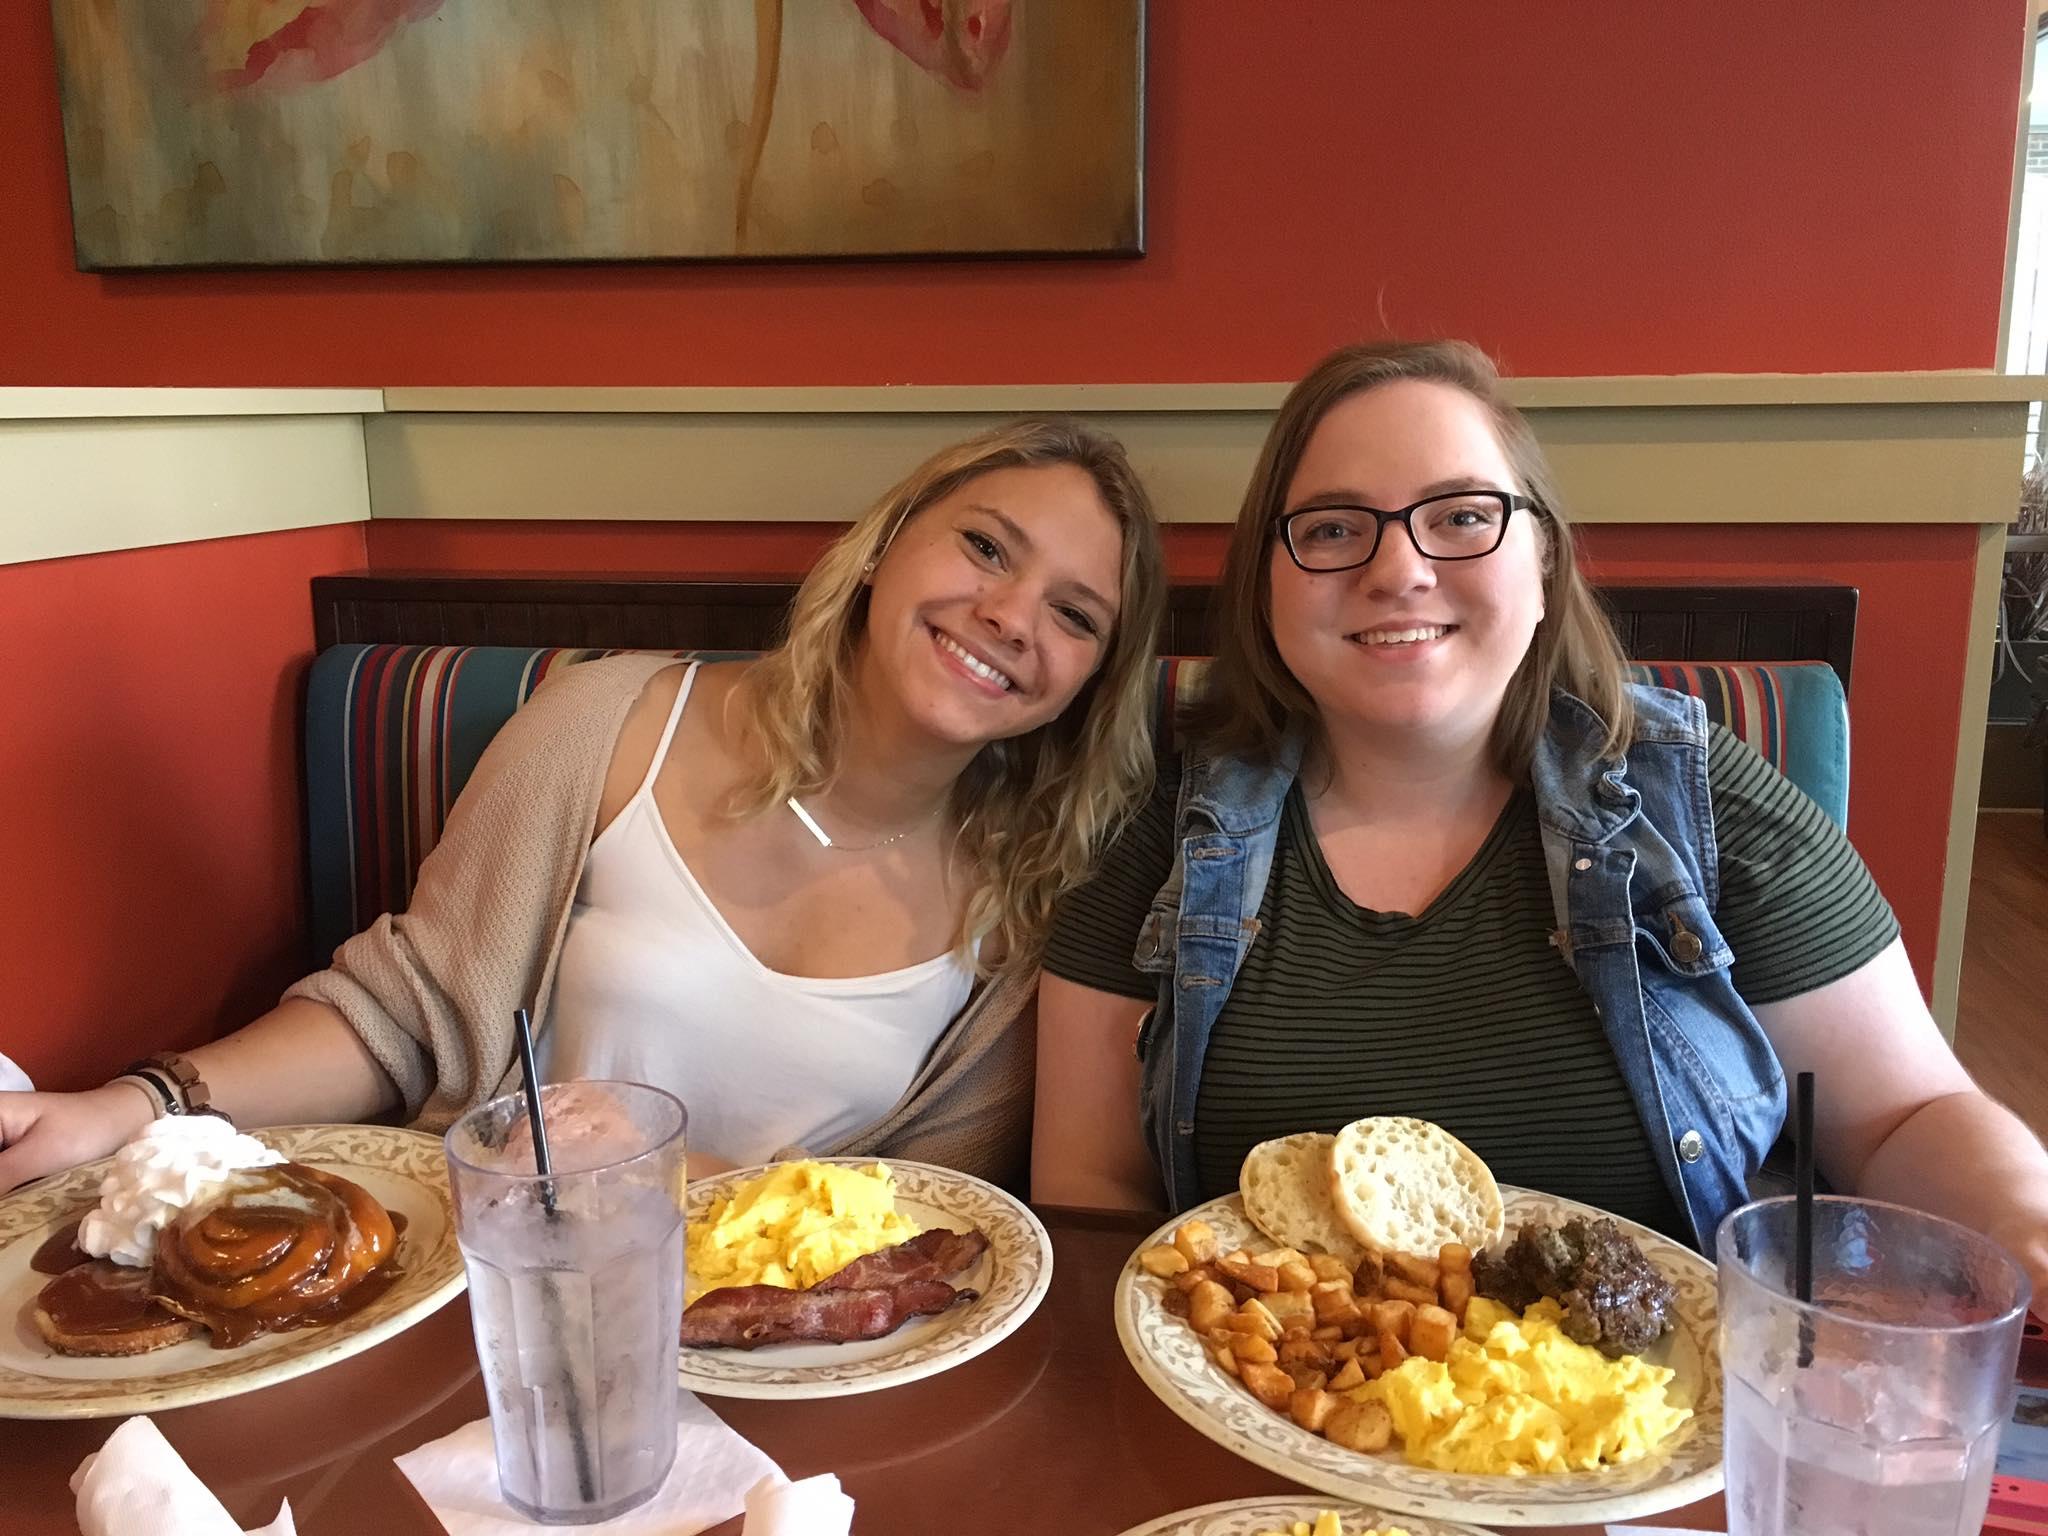 Greetings from Purdue University Students, Emily & Sam! Enjoying Another Broken Egg!